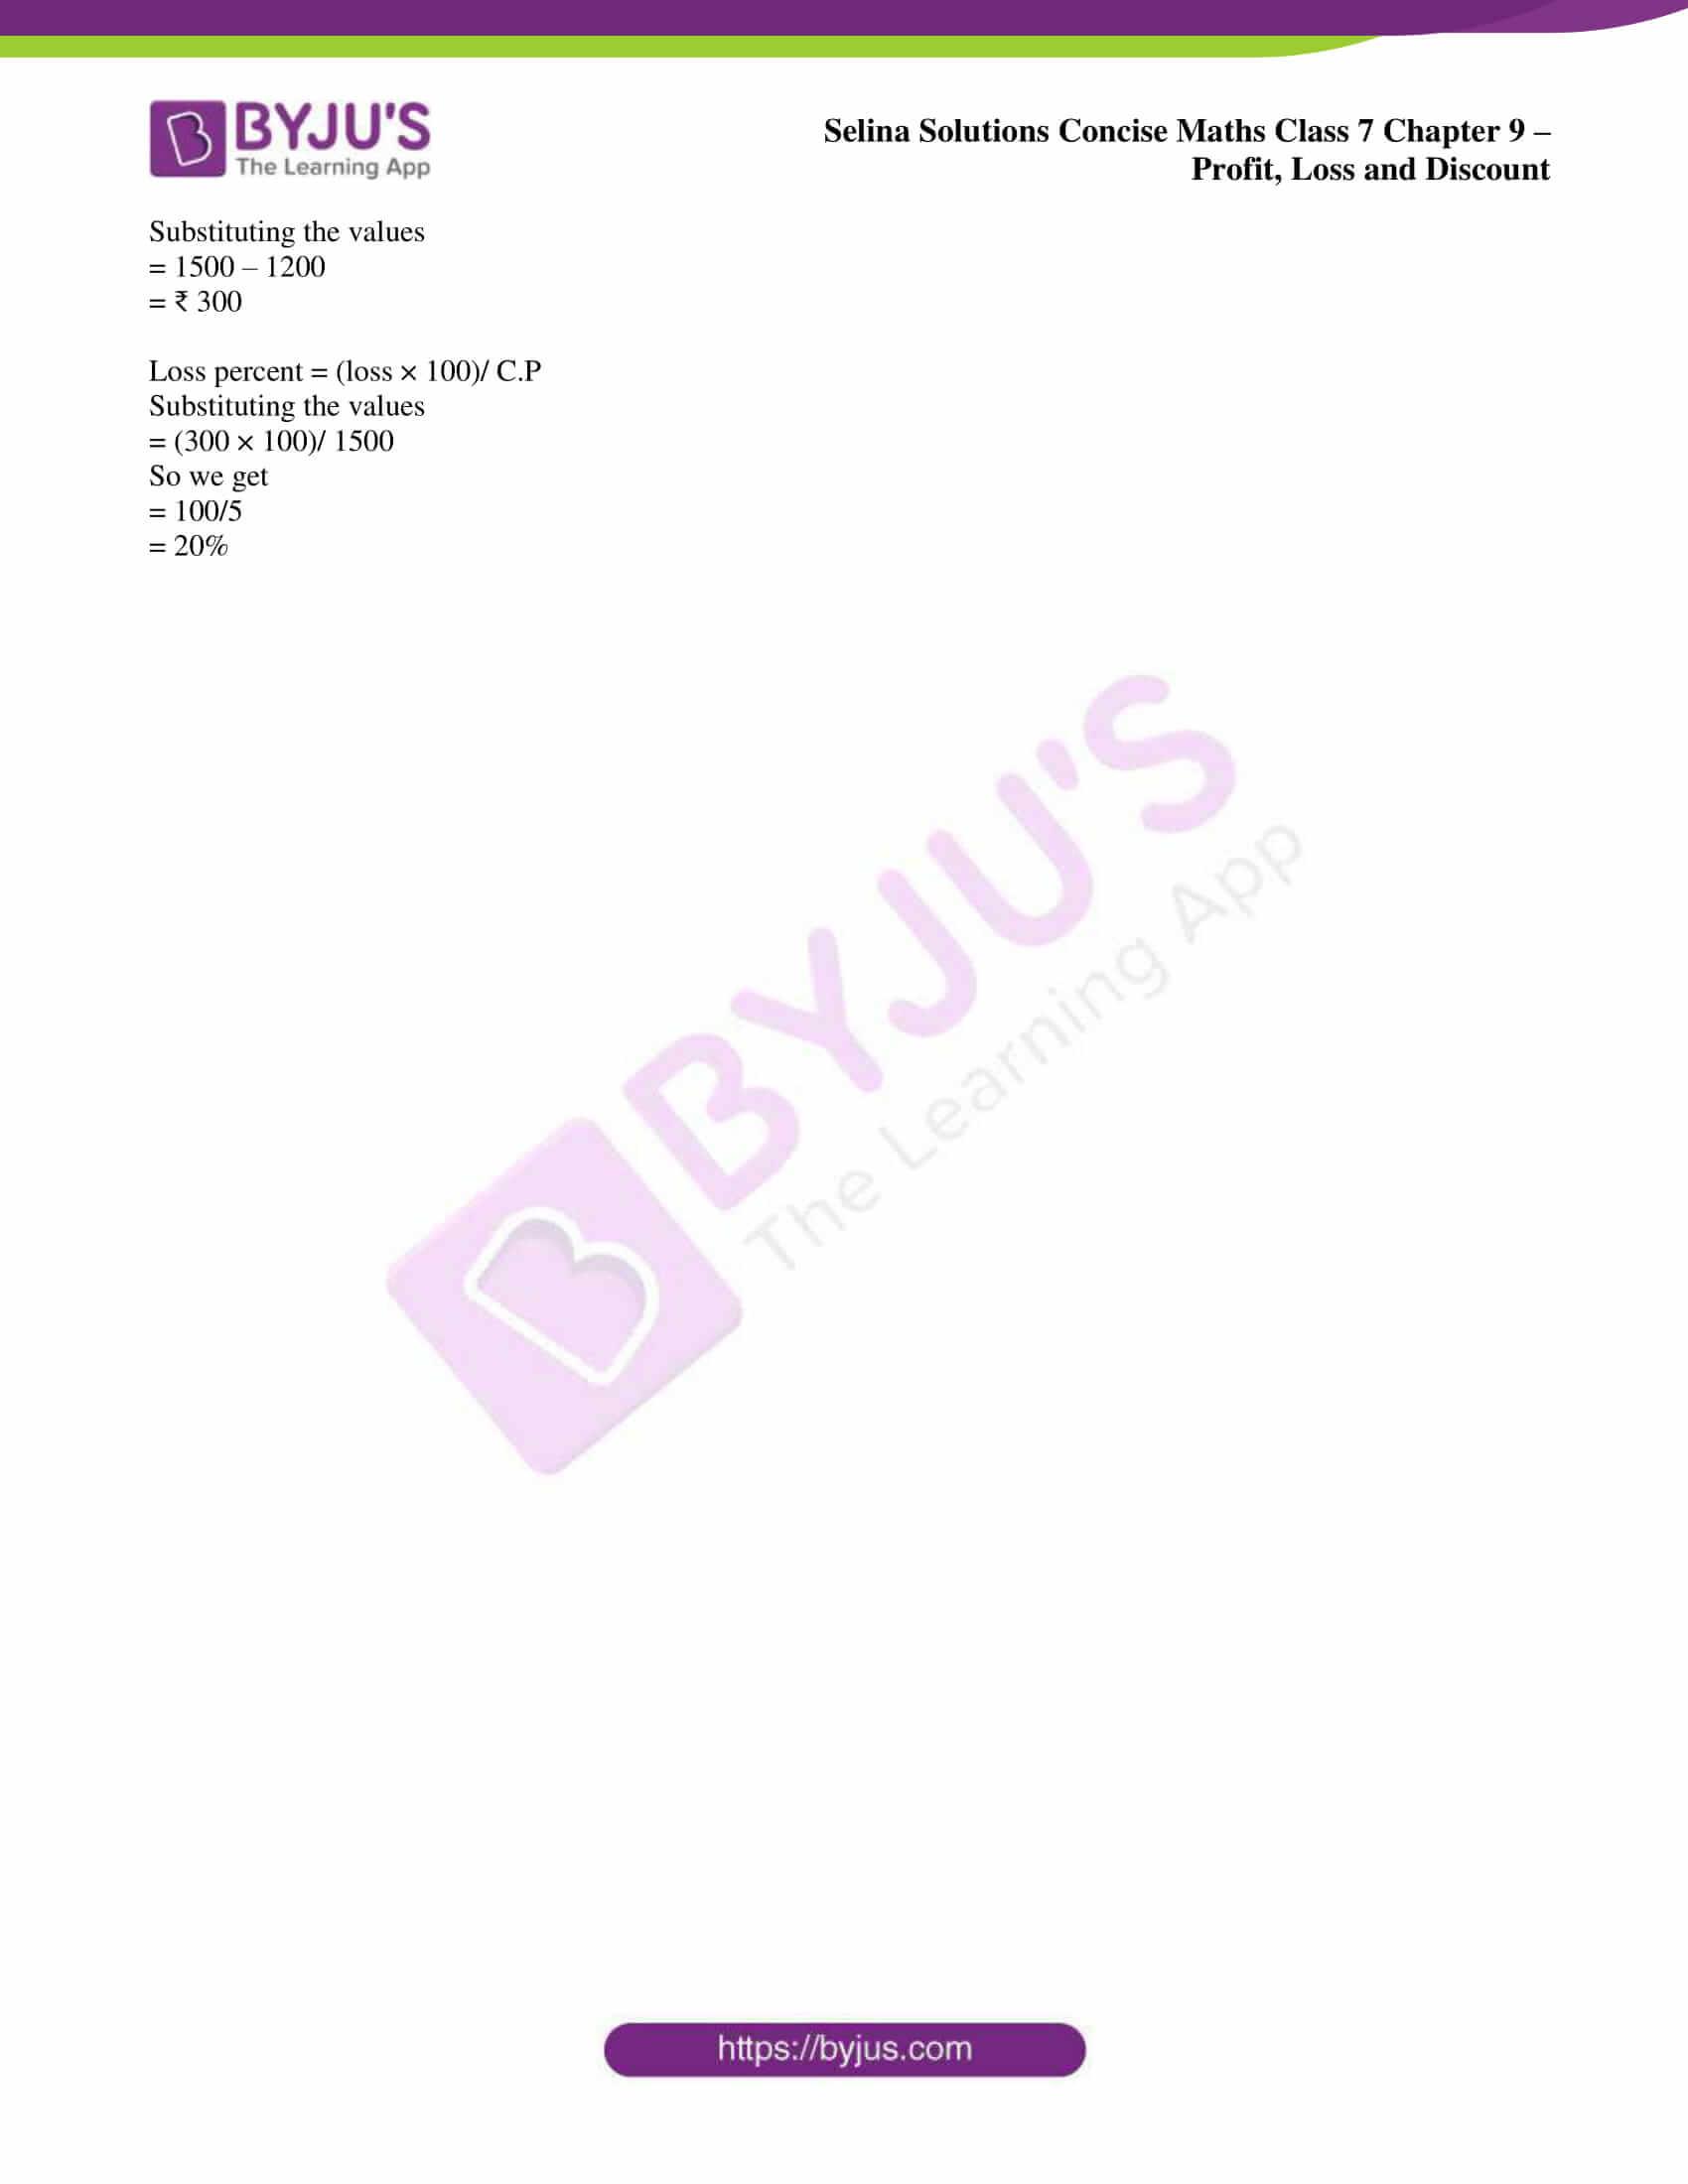 selina sol concise maths class 7 ch9 ex 9a 6